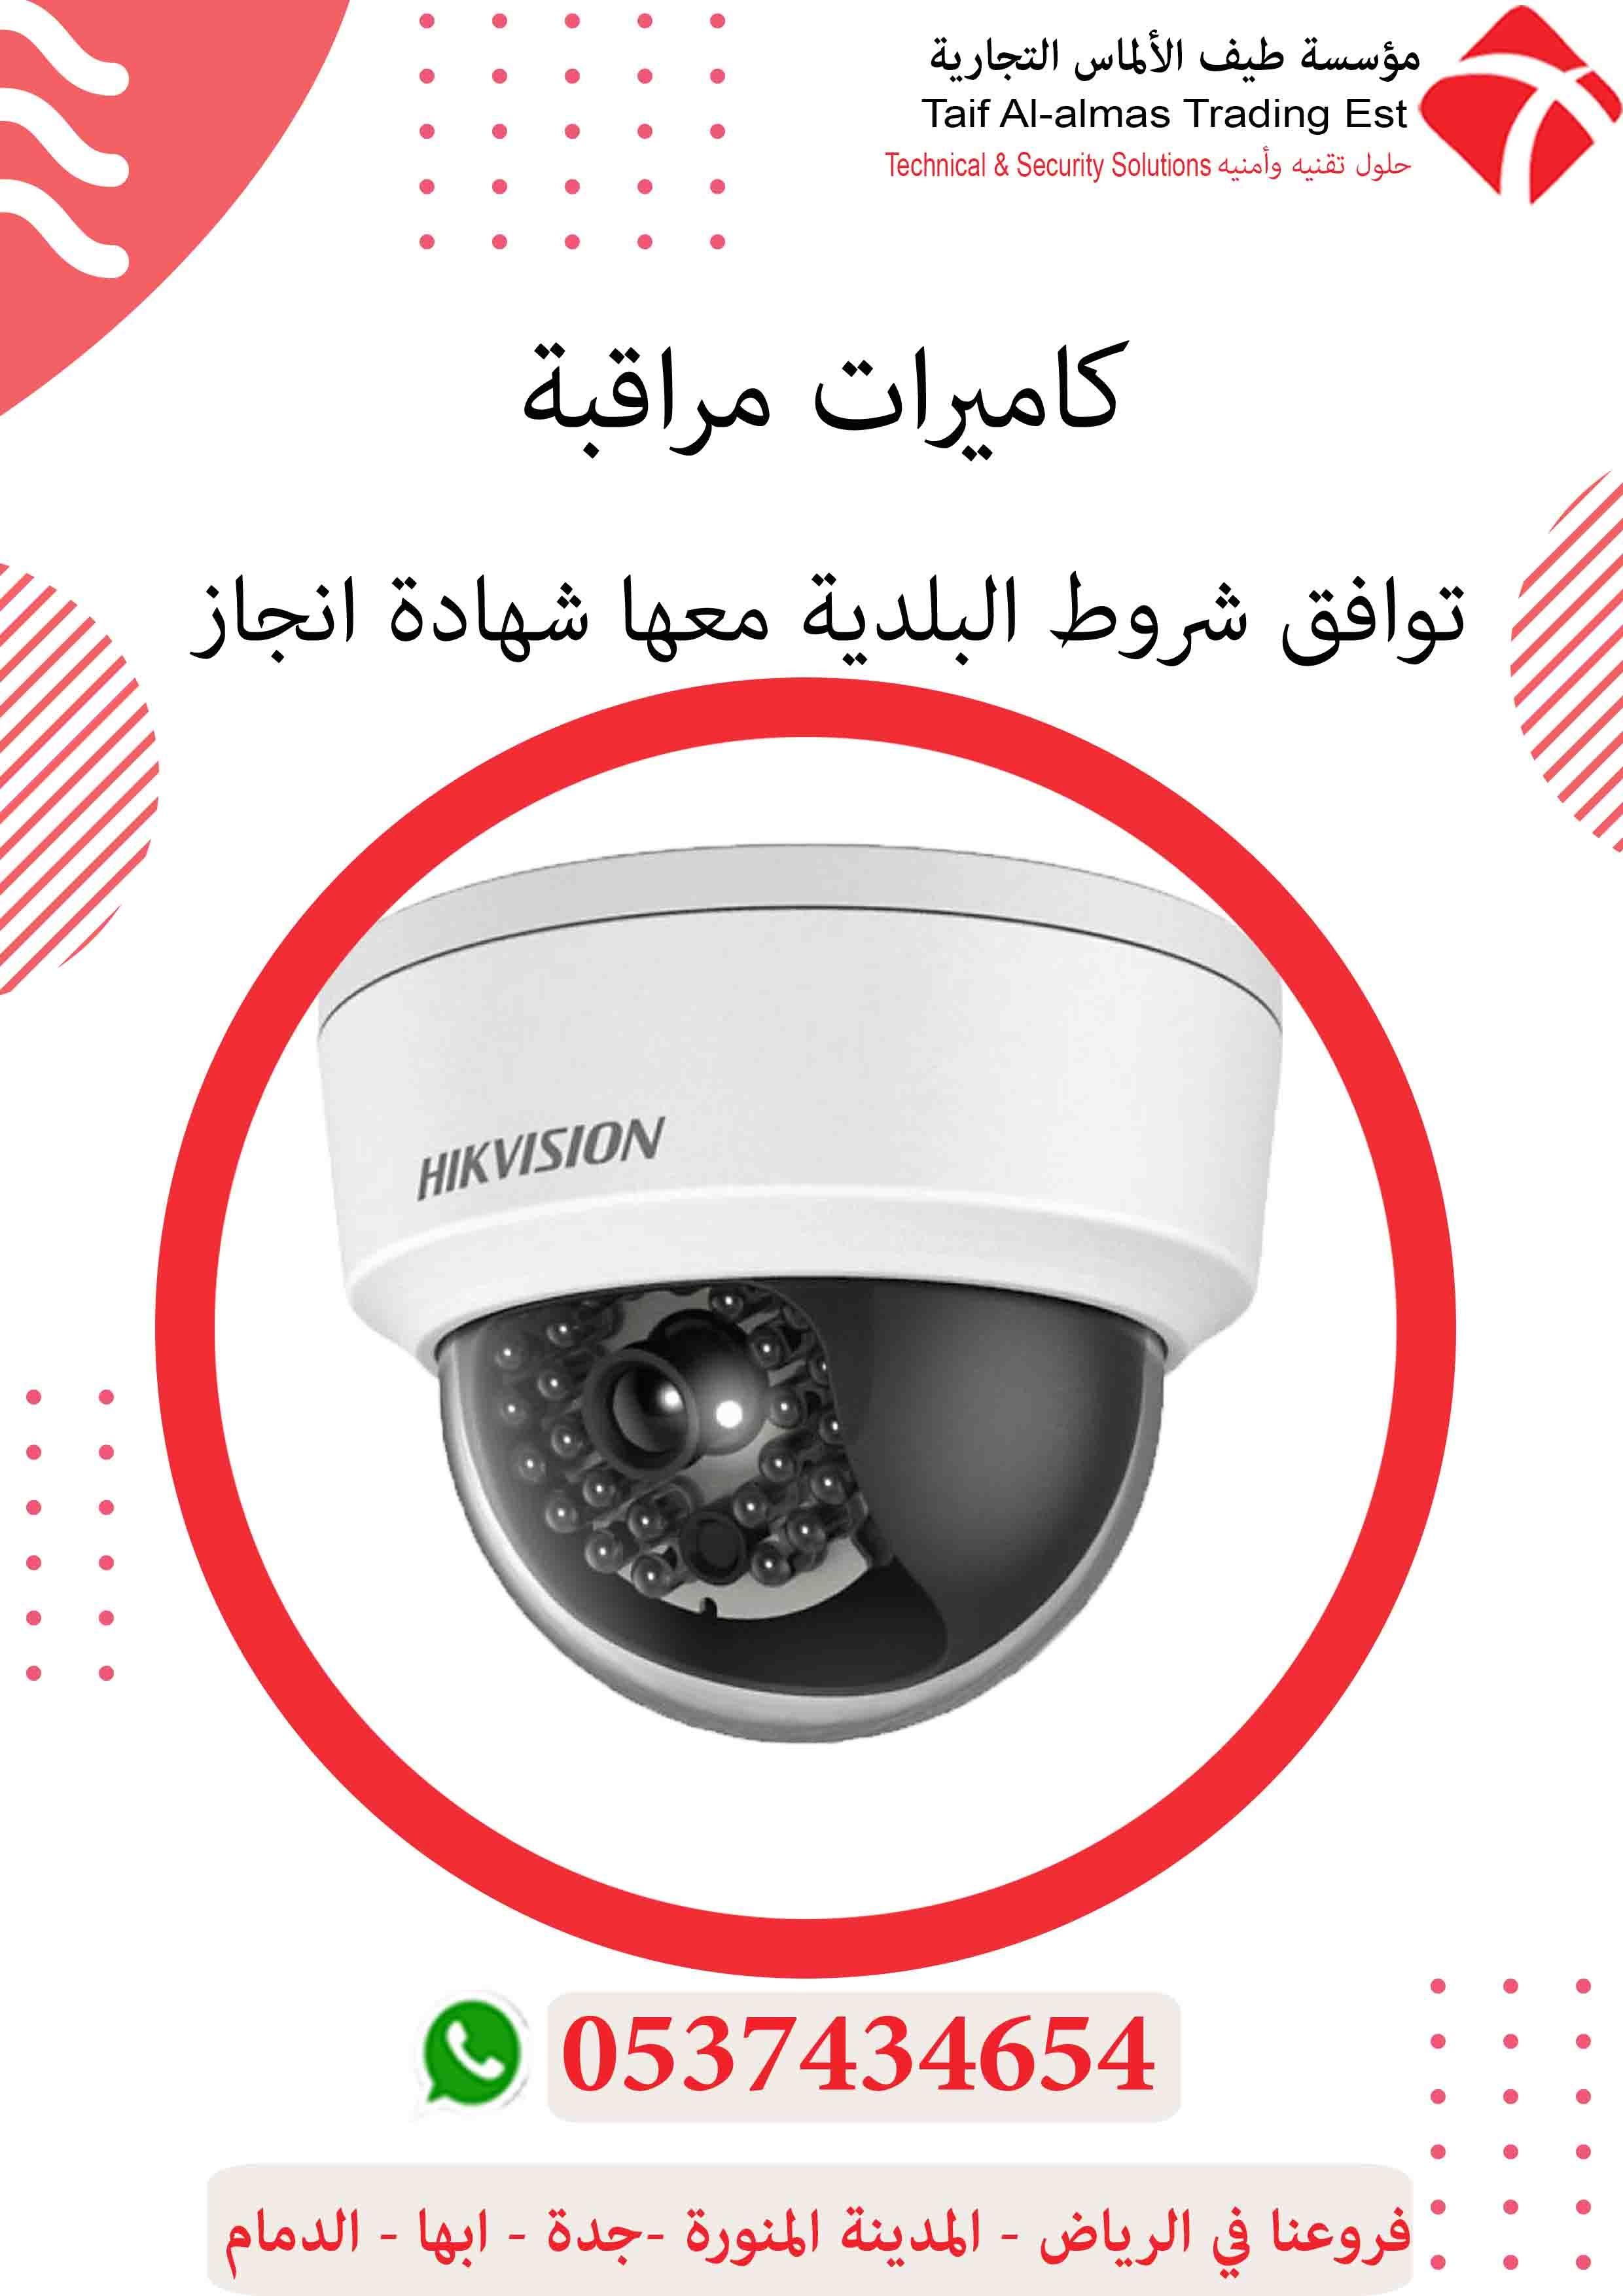 كاميرات مراقبة و عقد صيانة شهادة إنجاز Security Solutions Taif Cotton Candy Machine